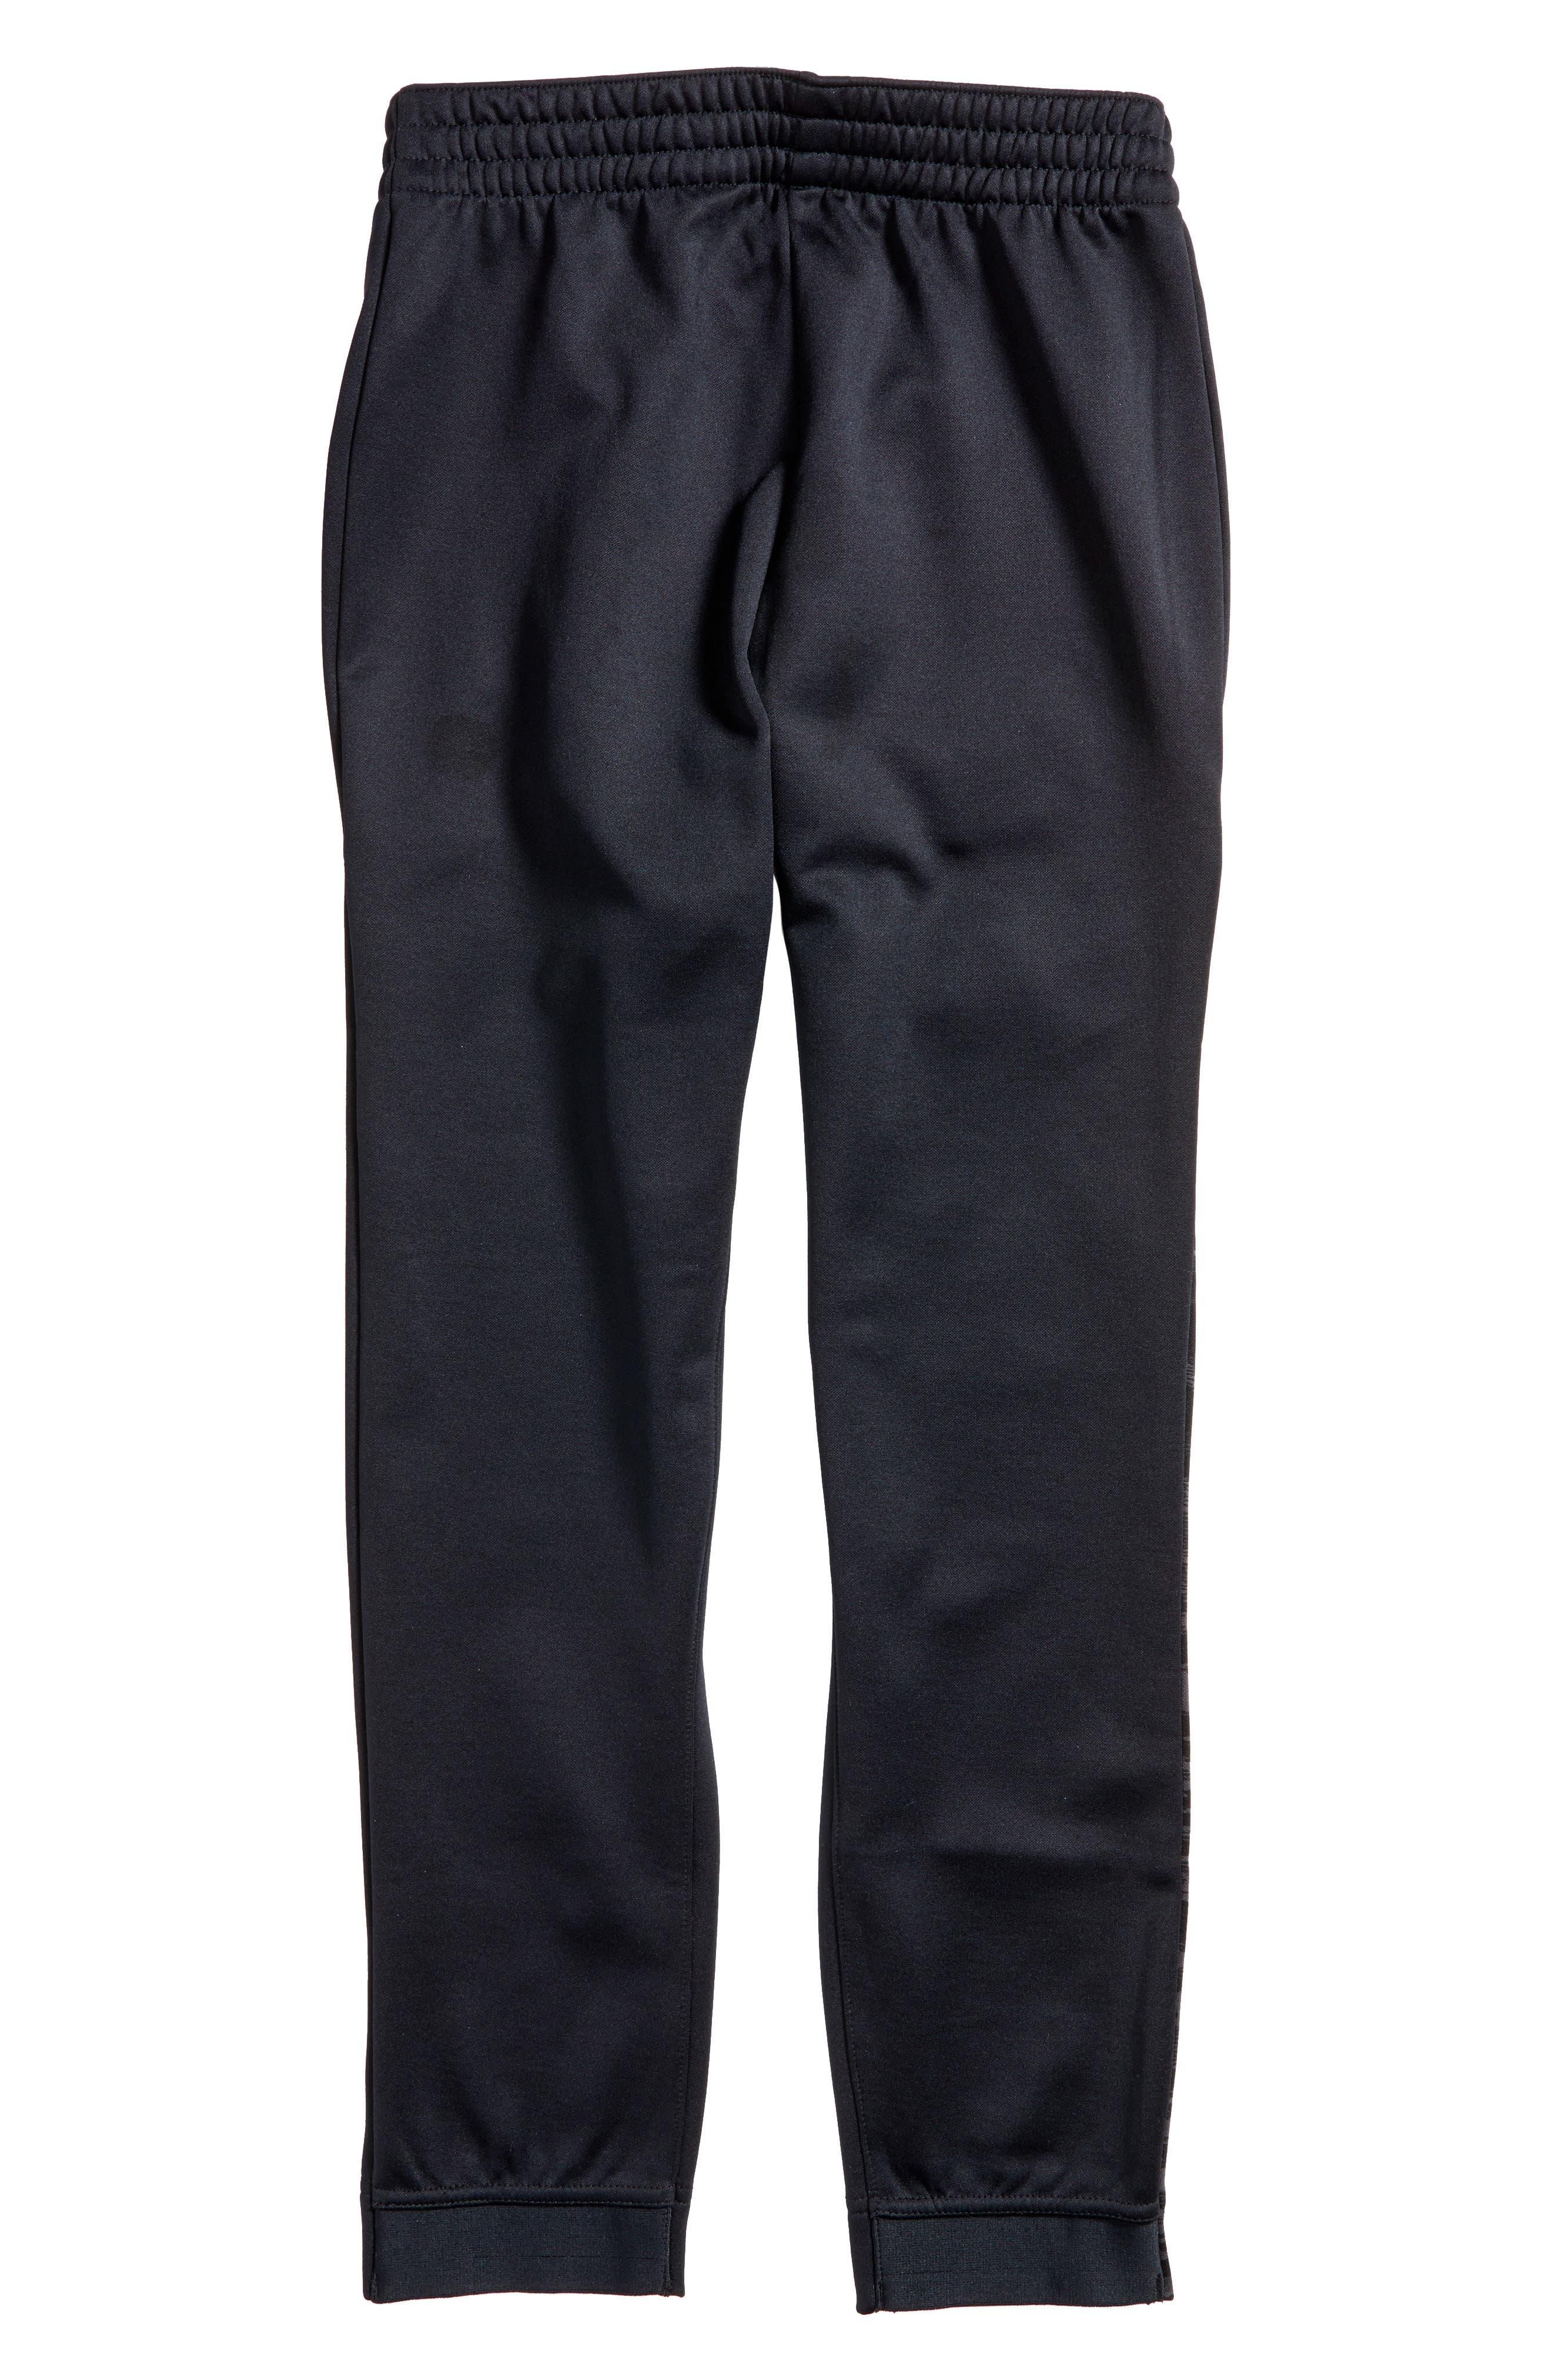 Therma Elite Pants,                             Main thumbnail 1, color,                             010